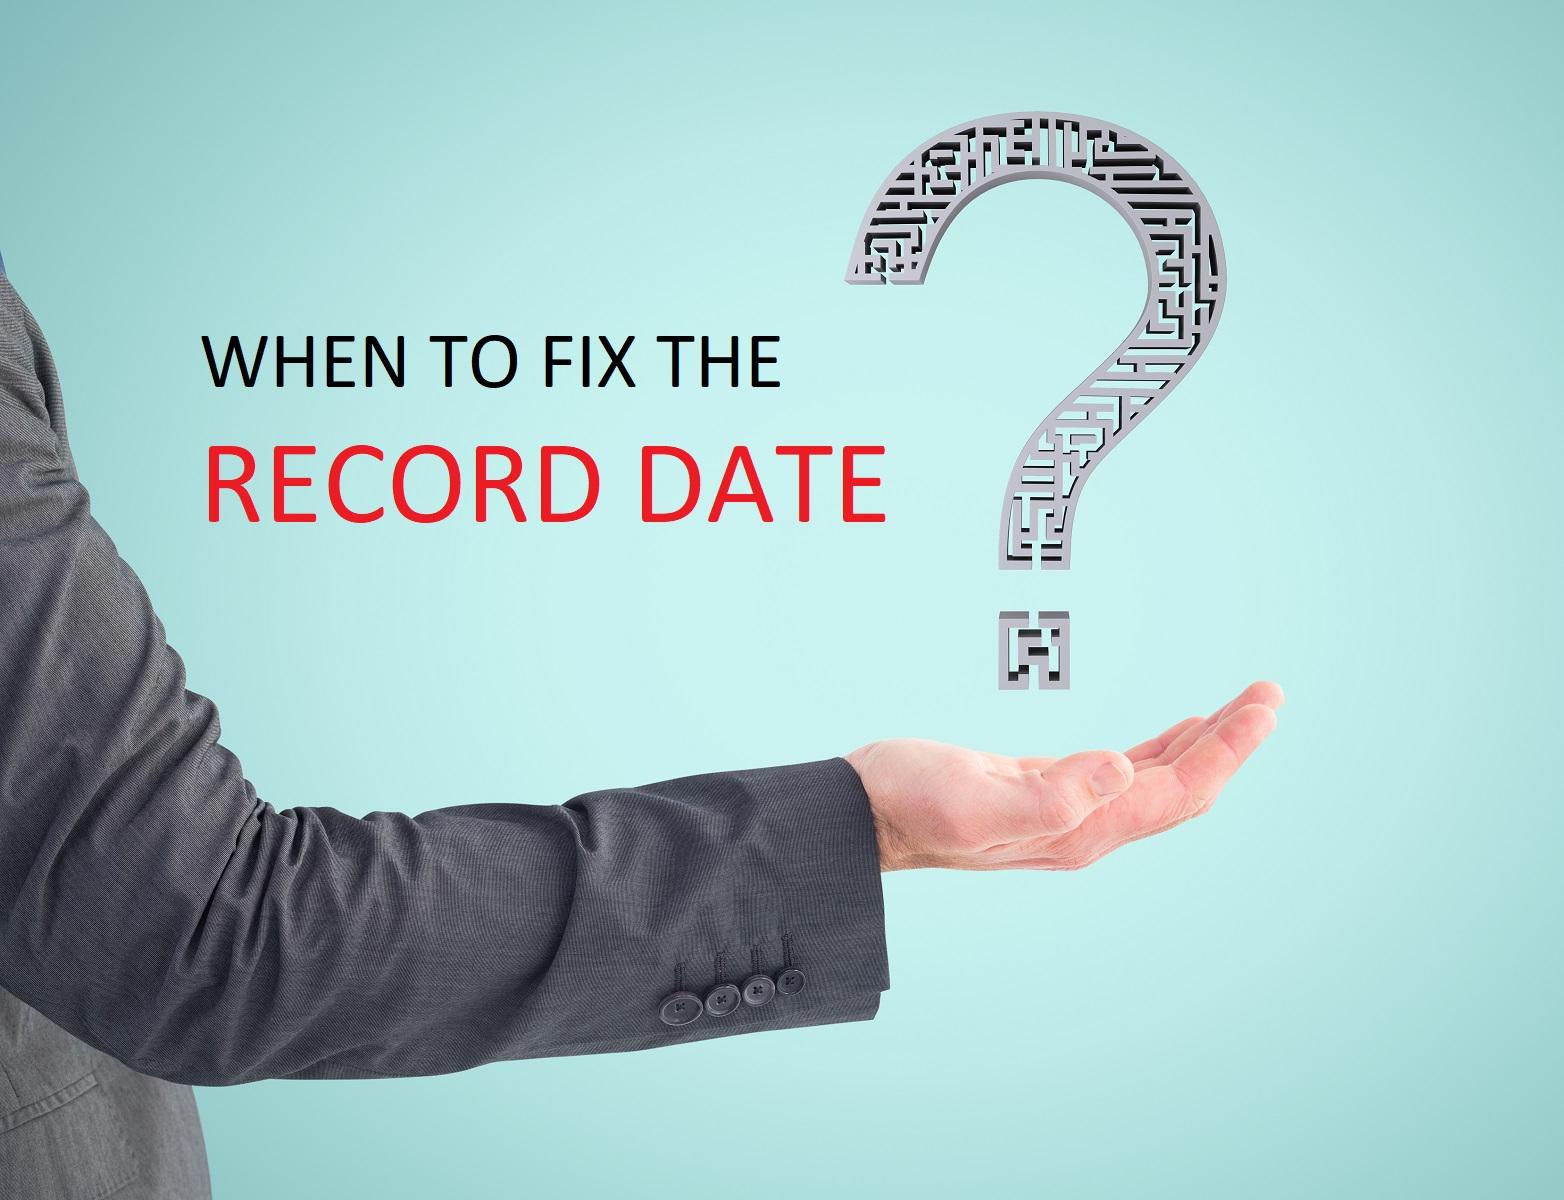 Demerger-MAN-Industries-Record-Date